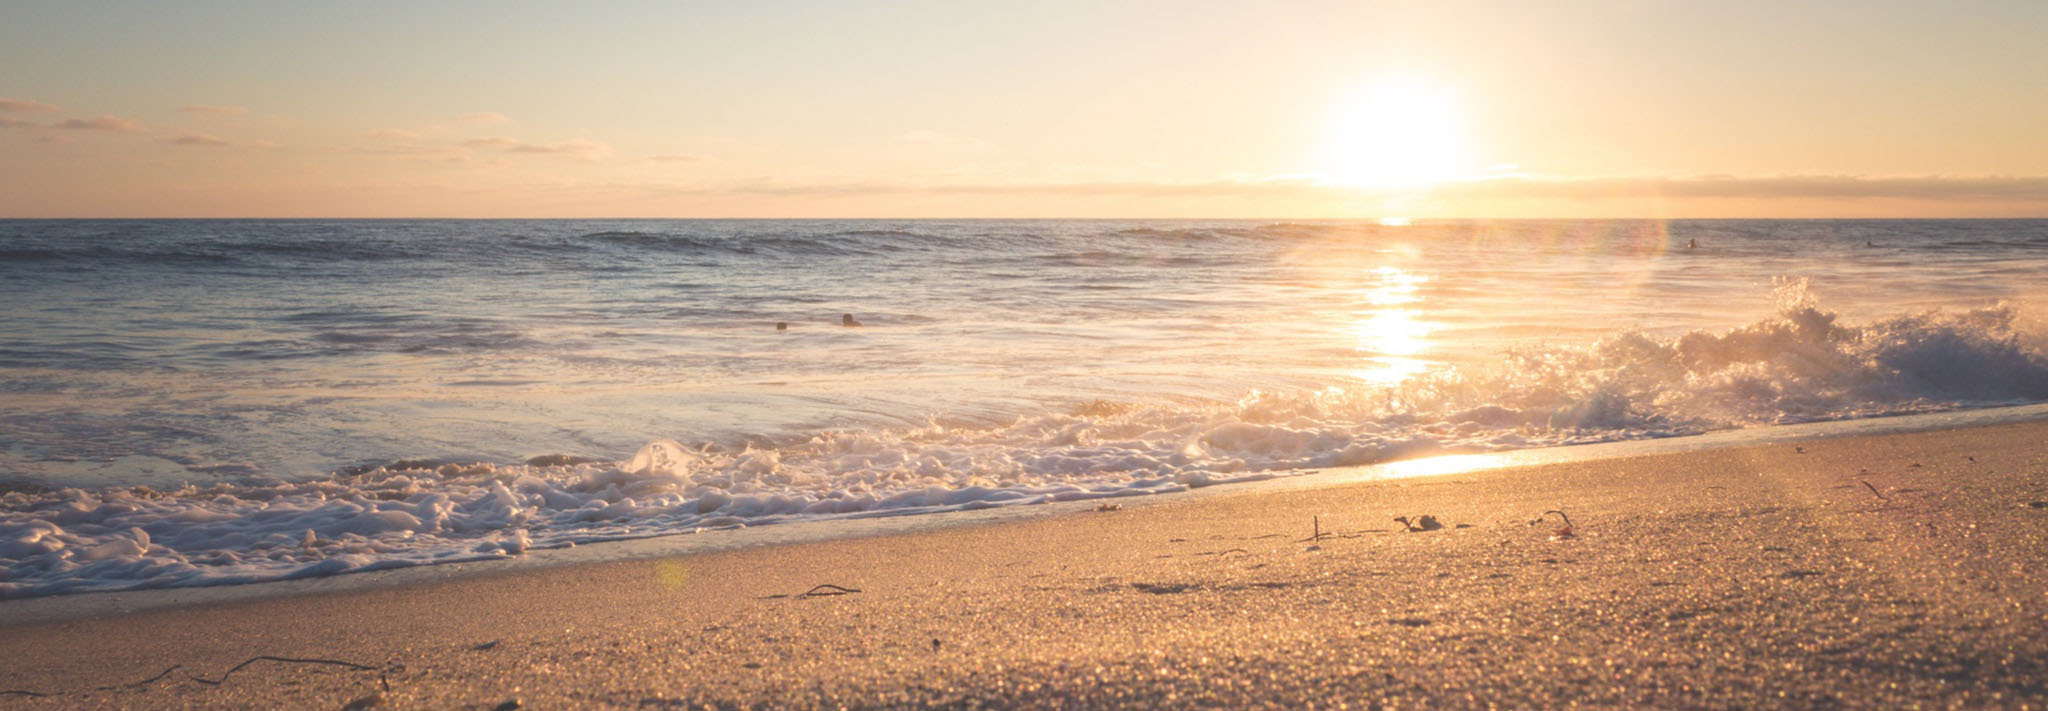 sea-beach-sunset-header